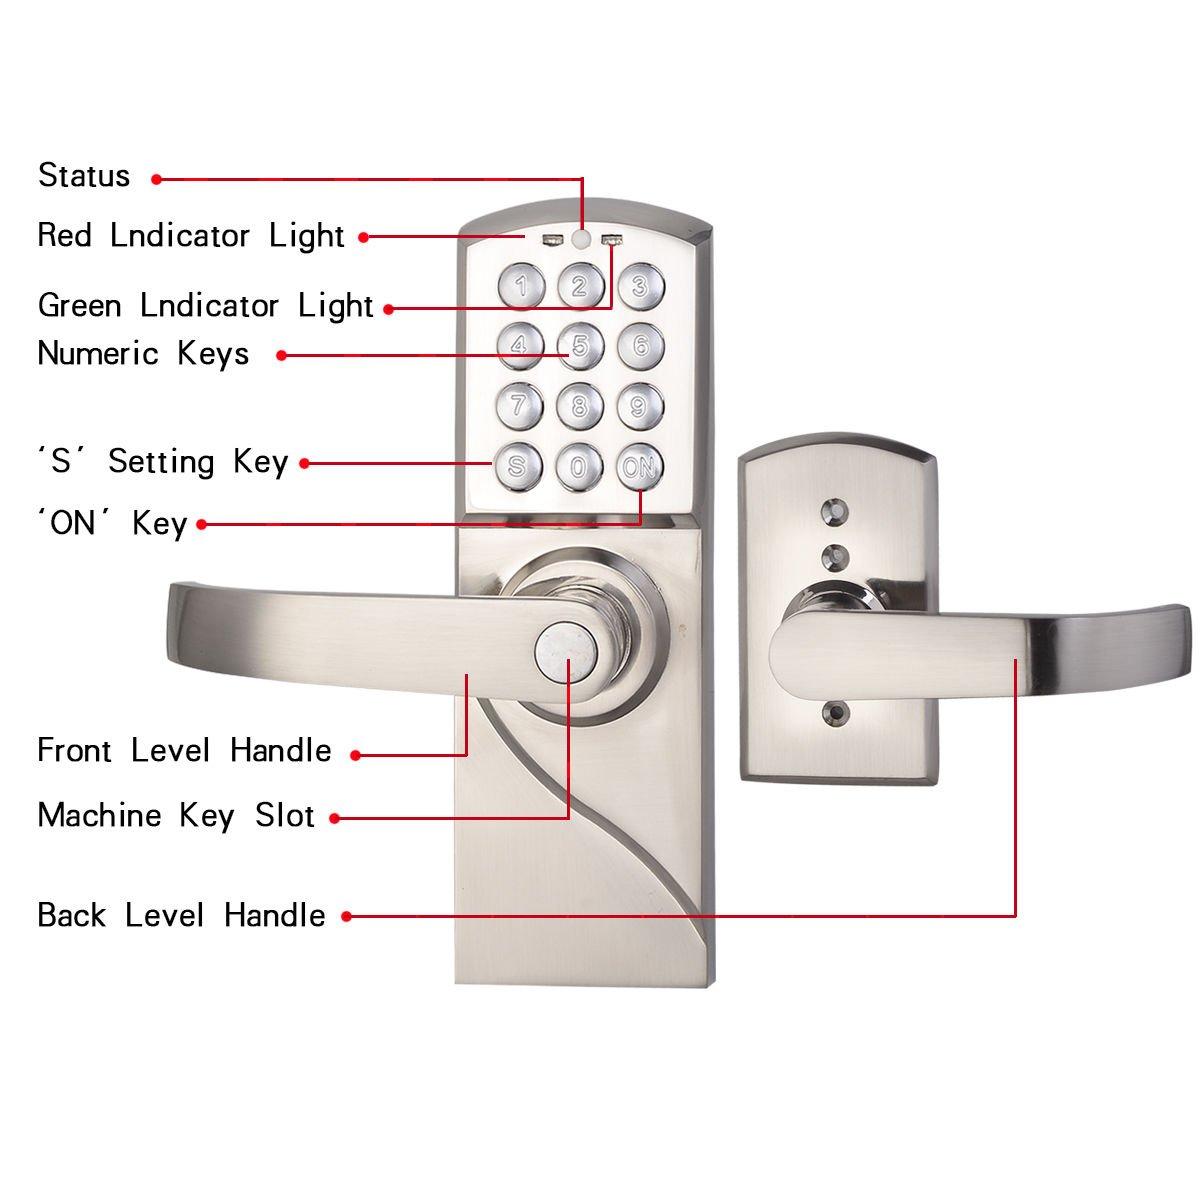 Amazon.com: Digital Electronic Security Entry Door Lock Left Handle ...